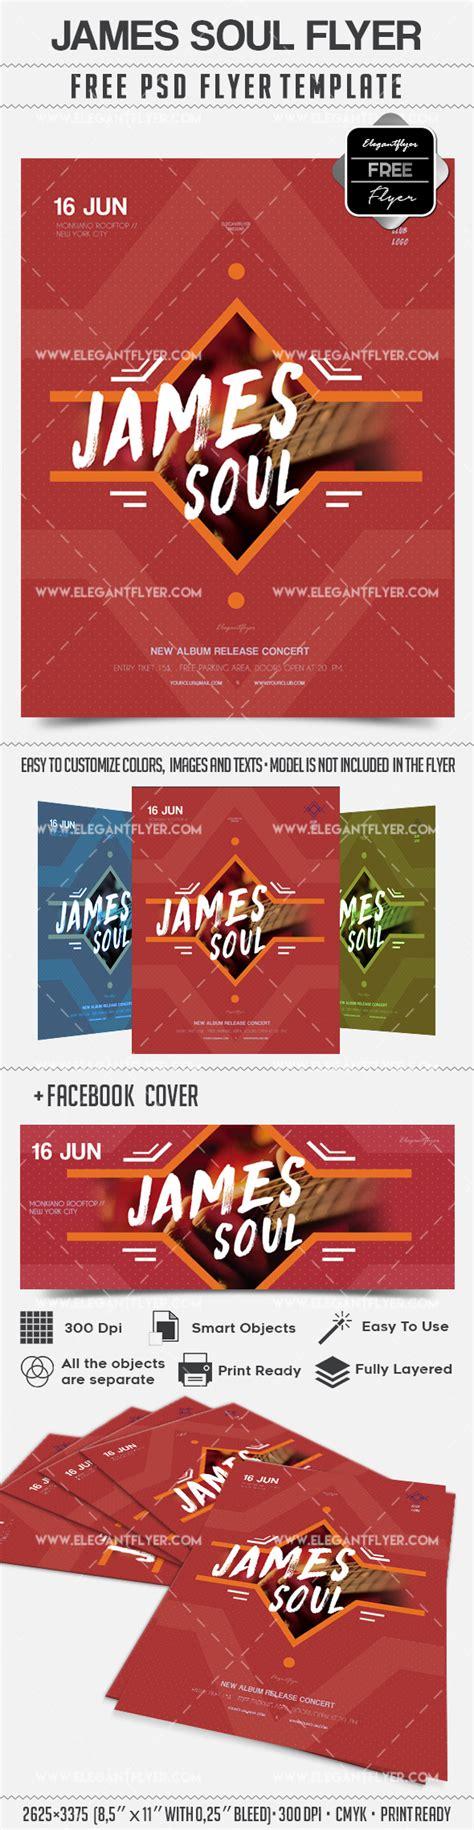 James Soul Concert Flyer Psd Template By Elegantflyer Free Concert Flyer Template Psd